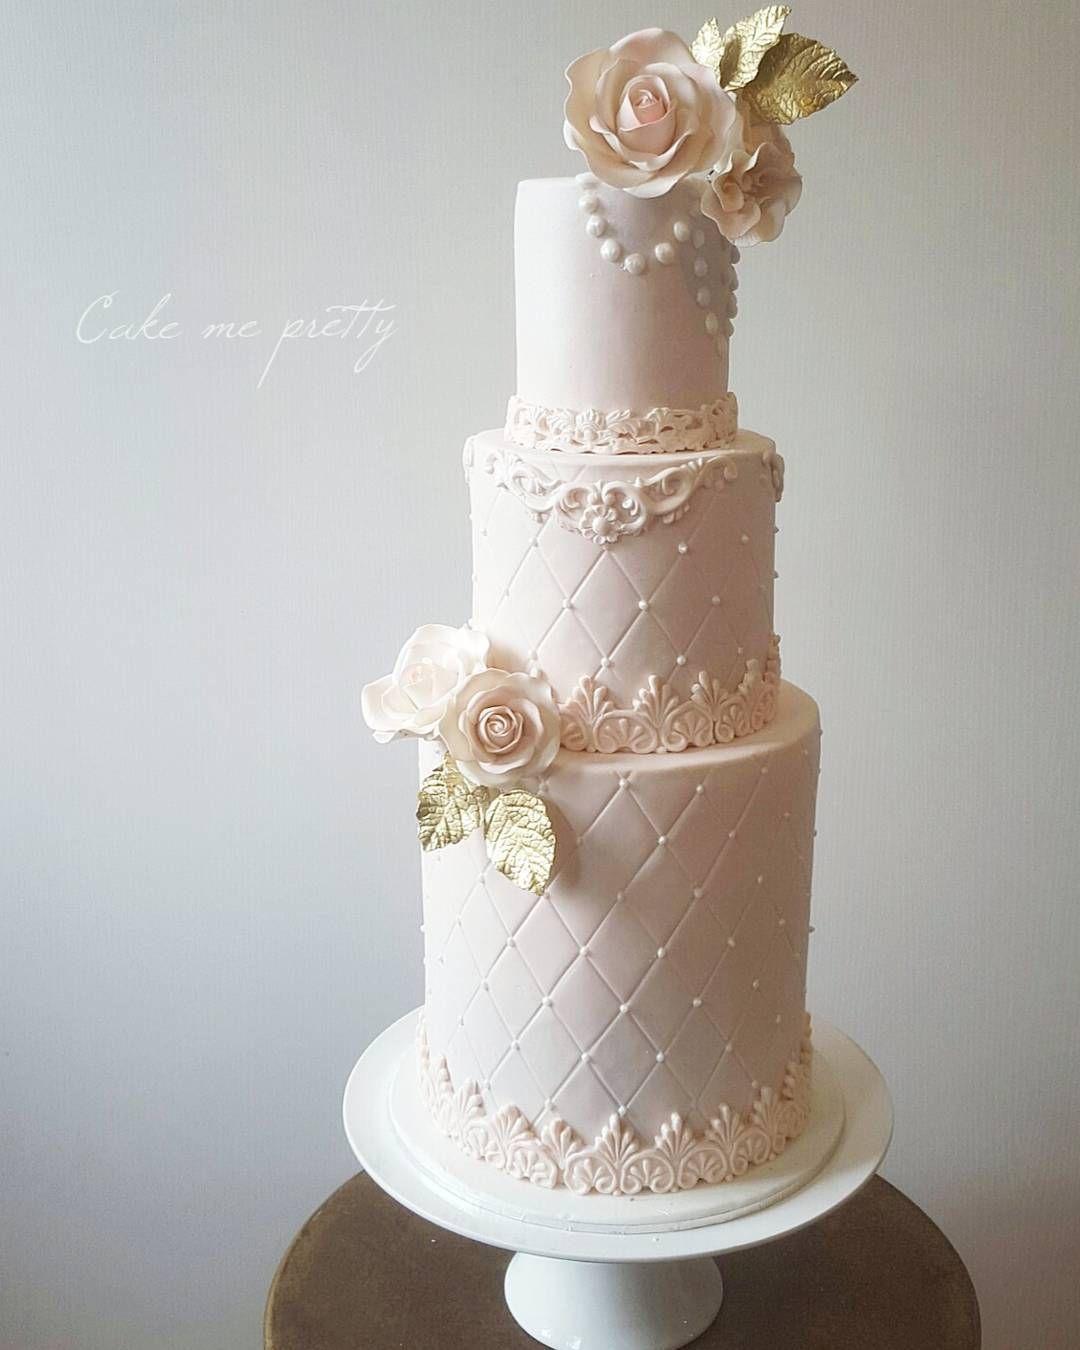 Instagram | cake ideas | Pinterest | Cake, Wedding cake and Cake designs